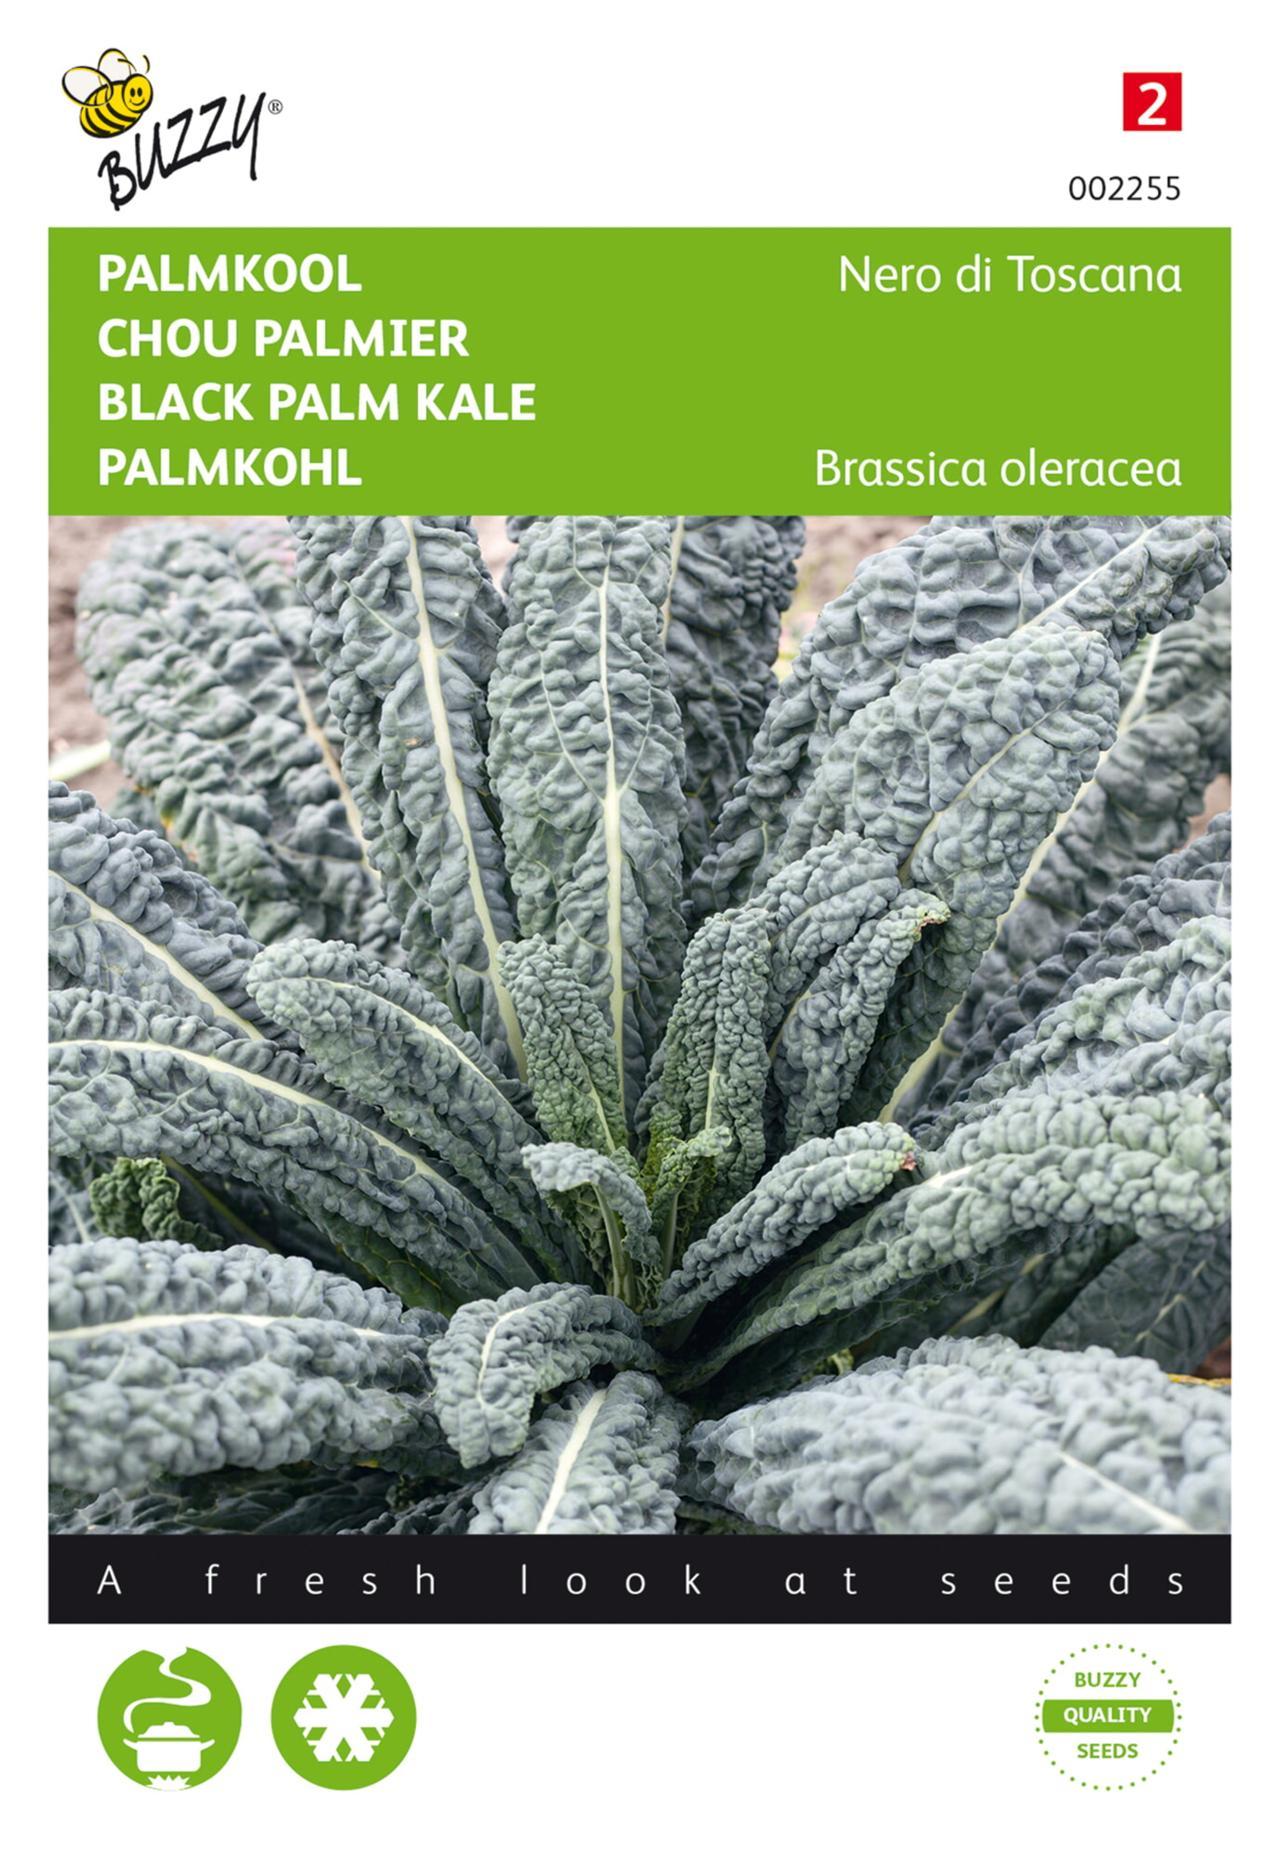 Brassica oleracea convar. acephala 'Nero di Toscana' plant